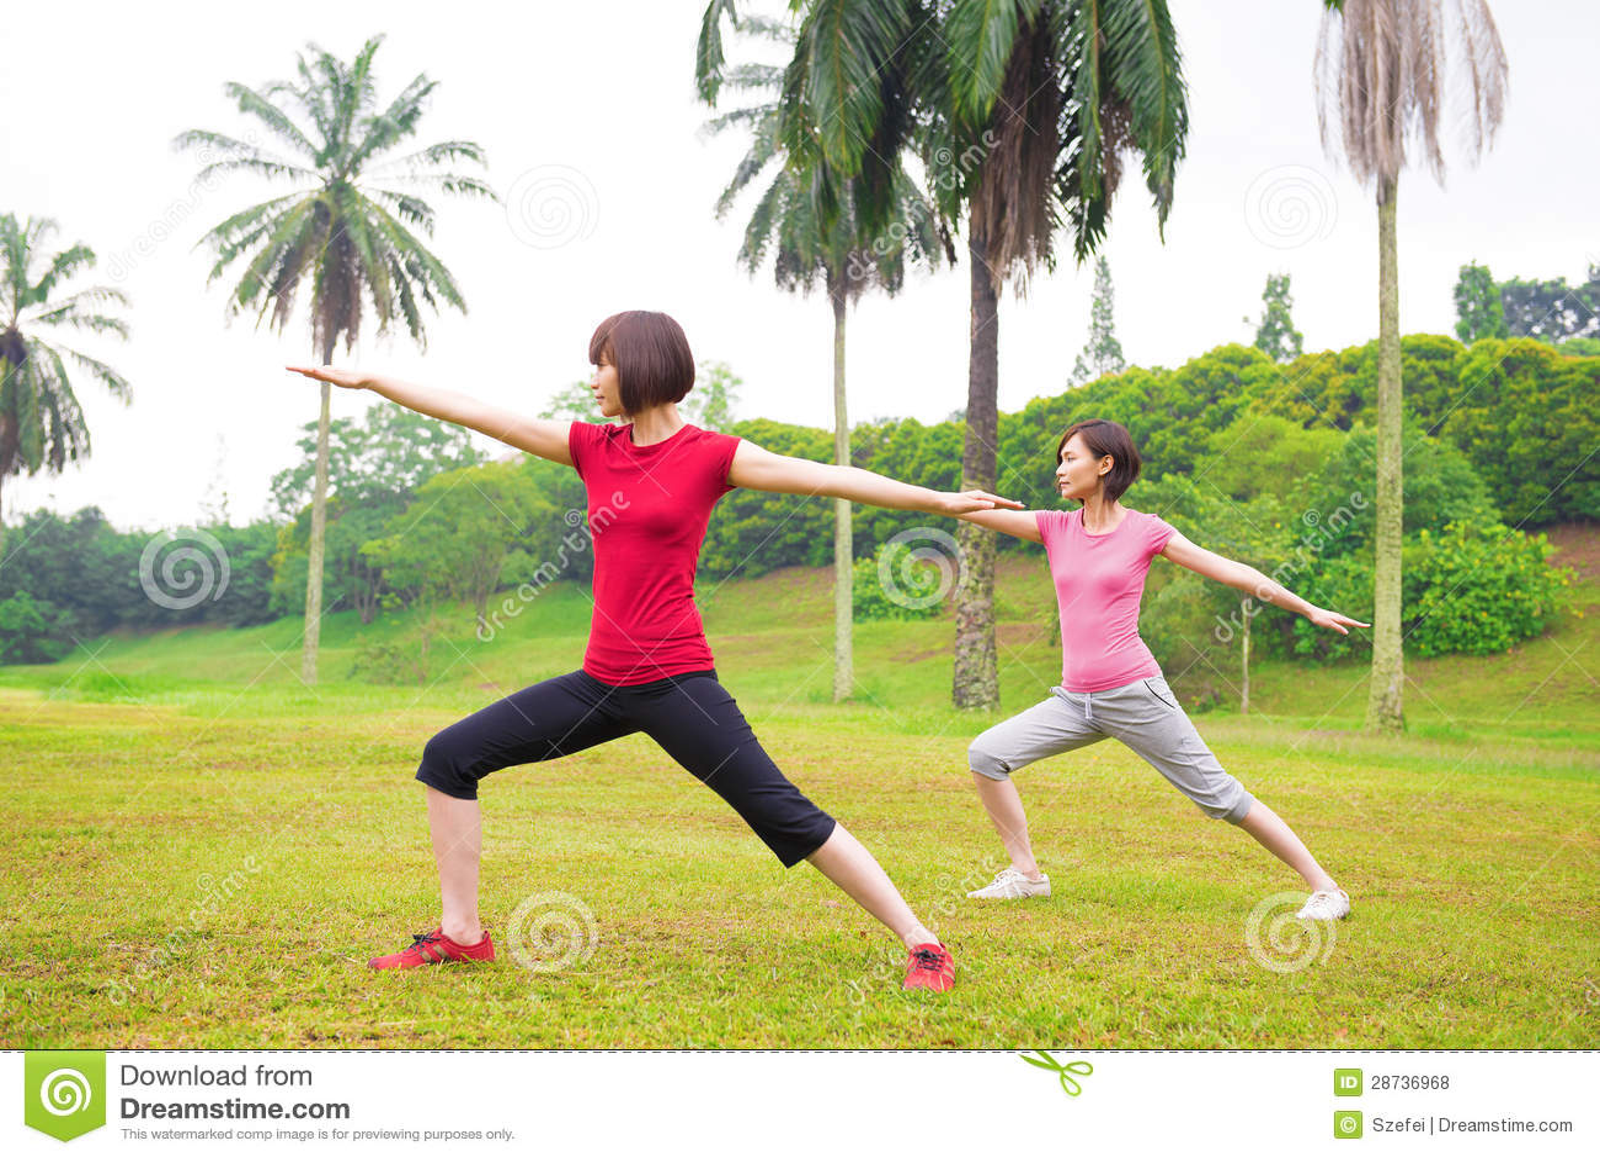 Asian girls yoga outdoor